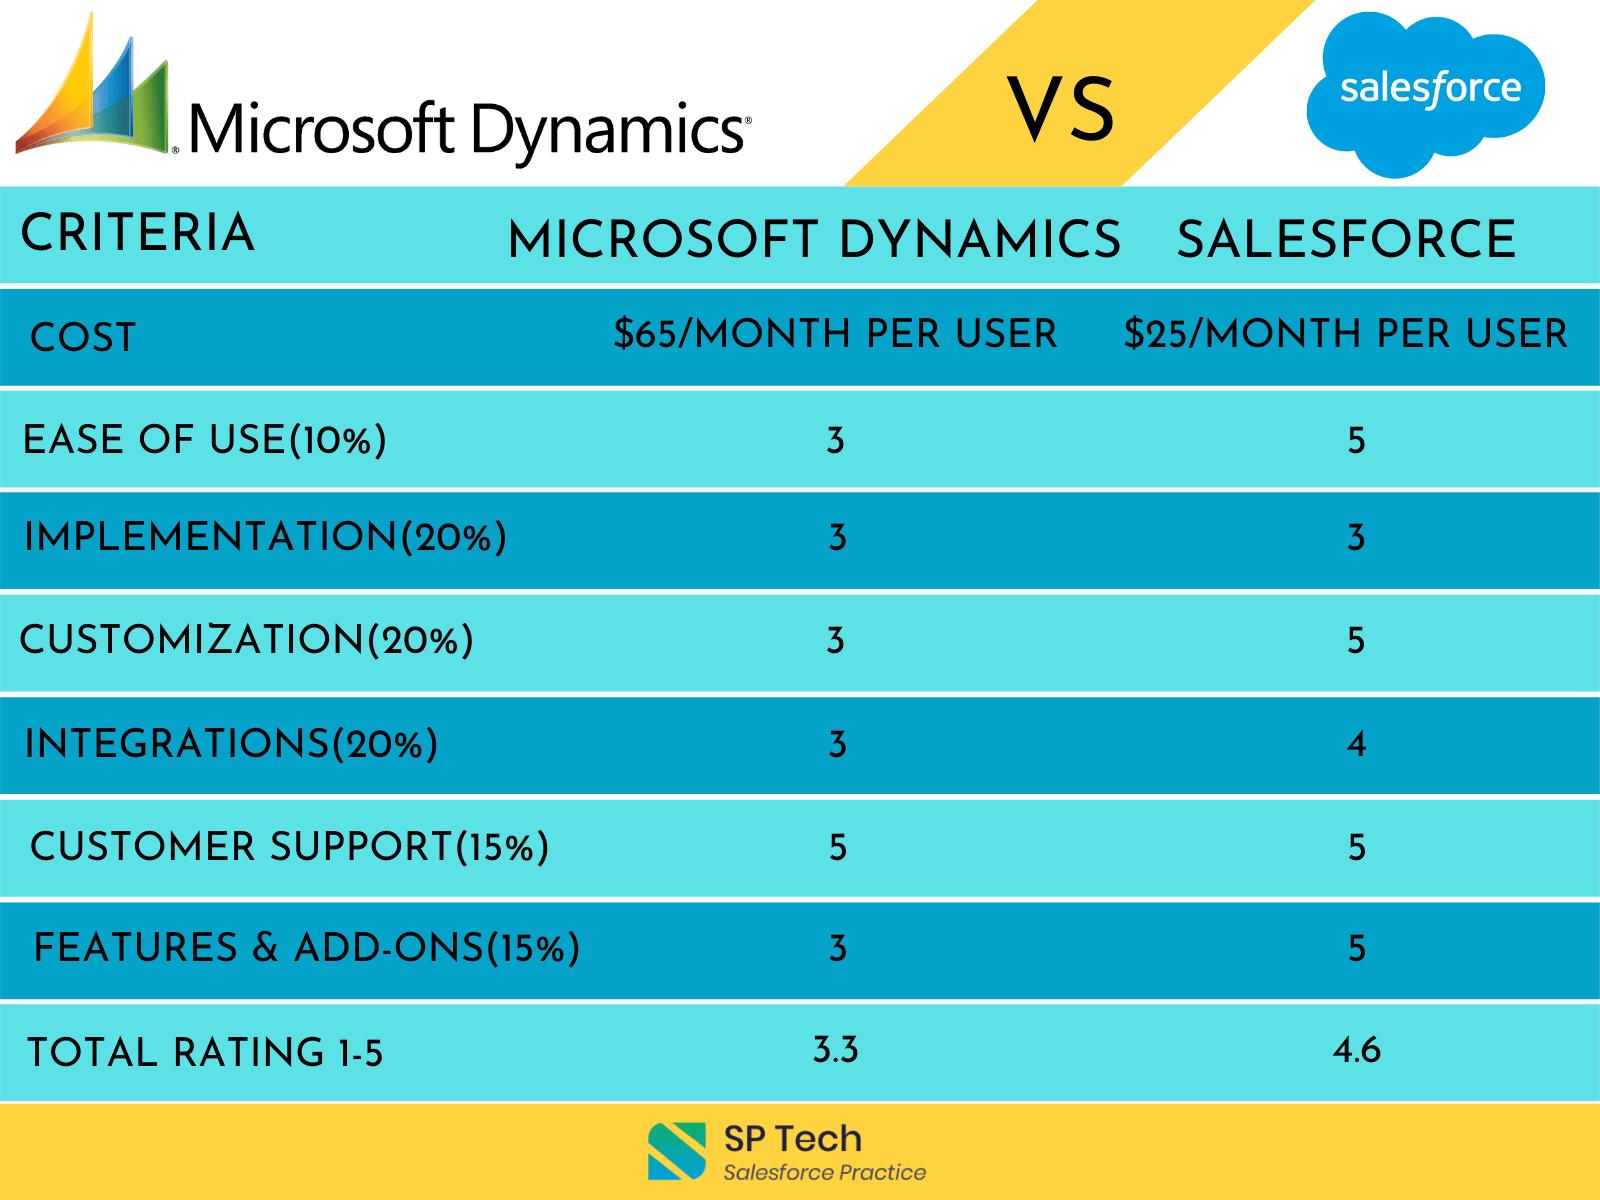 Microsoft-Dynamics-vs-Salesforce